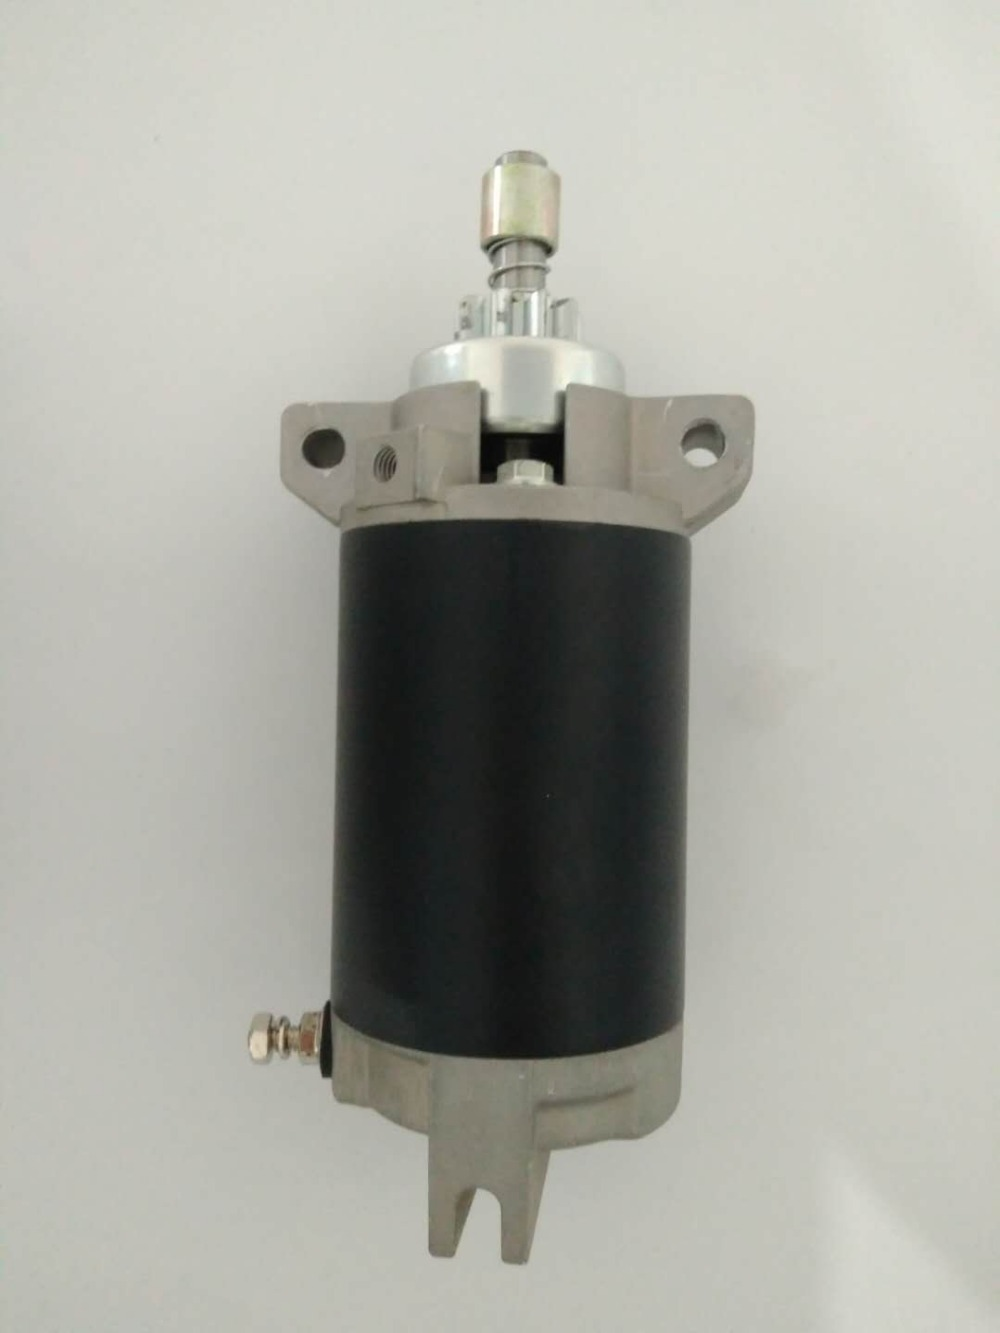 Start Motor For 40HP YAMAHA Outboard Engine Electric Starter 66T-81800-03 E40X 40HP 40hv Enduro